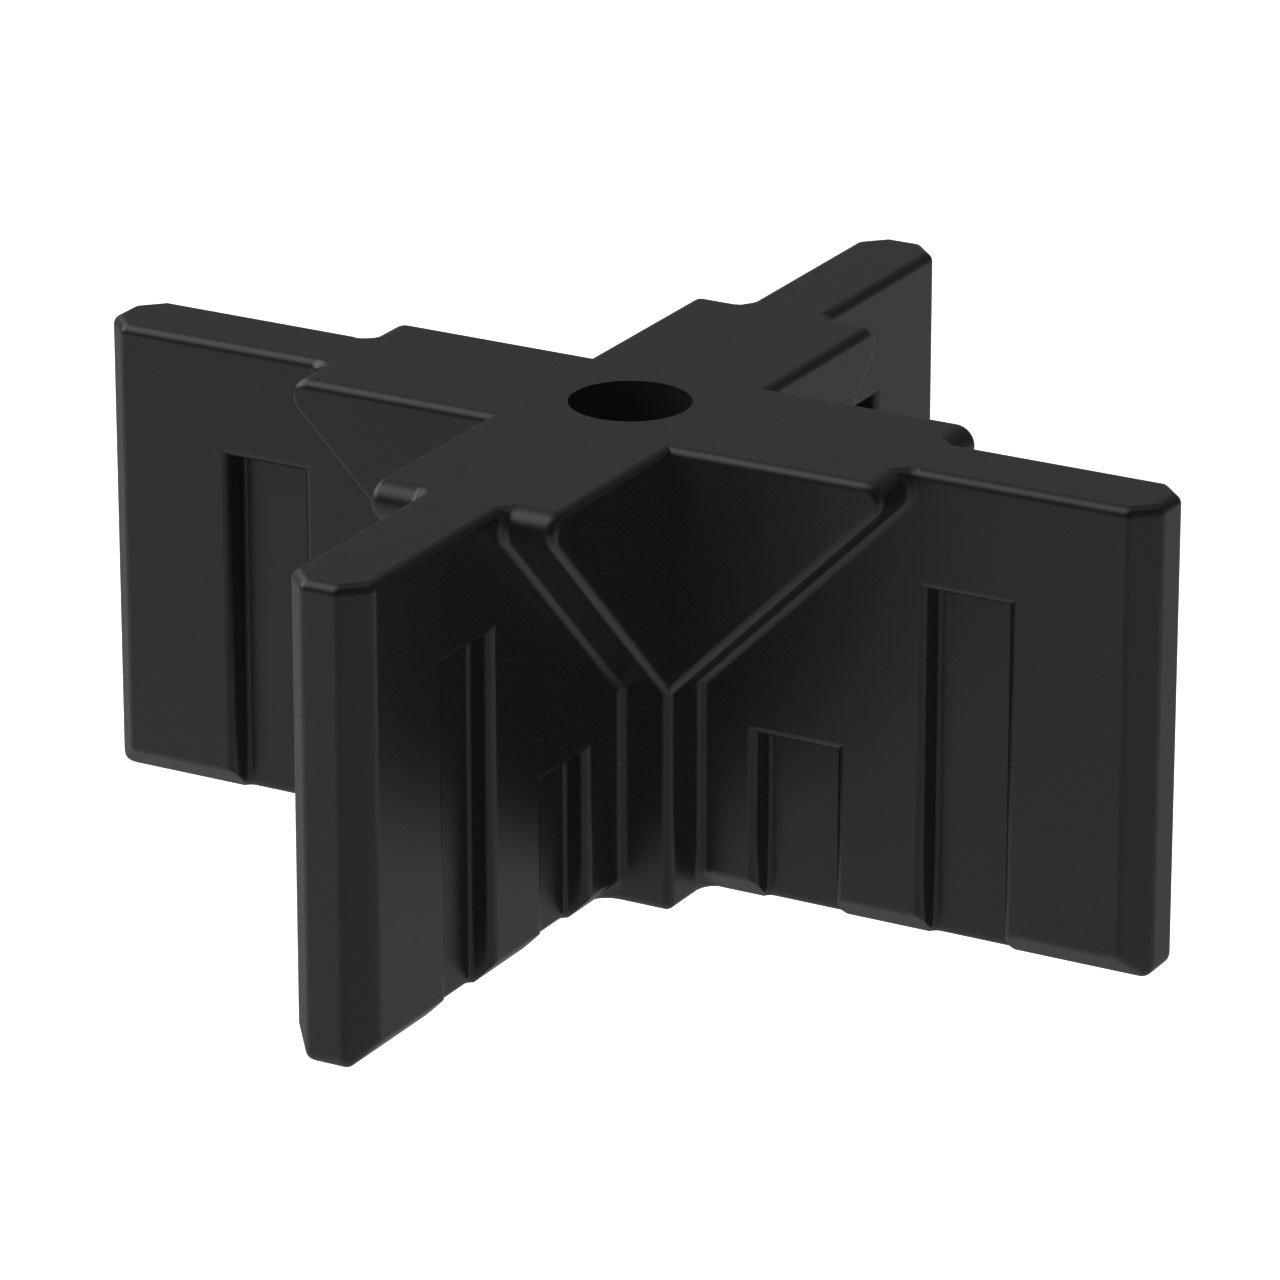 GOGO Panels - CX2B - Cream White - Top 4-Way Connector